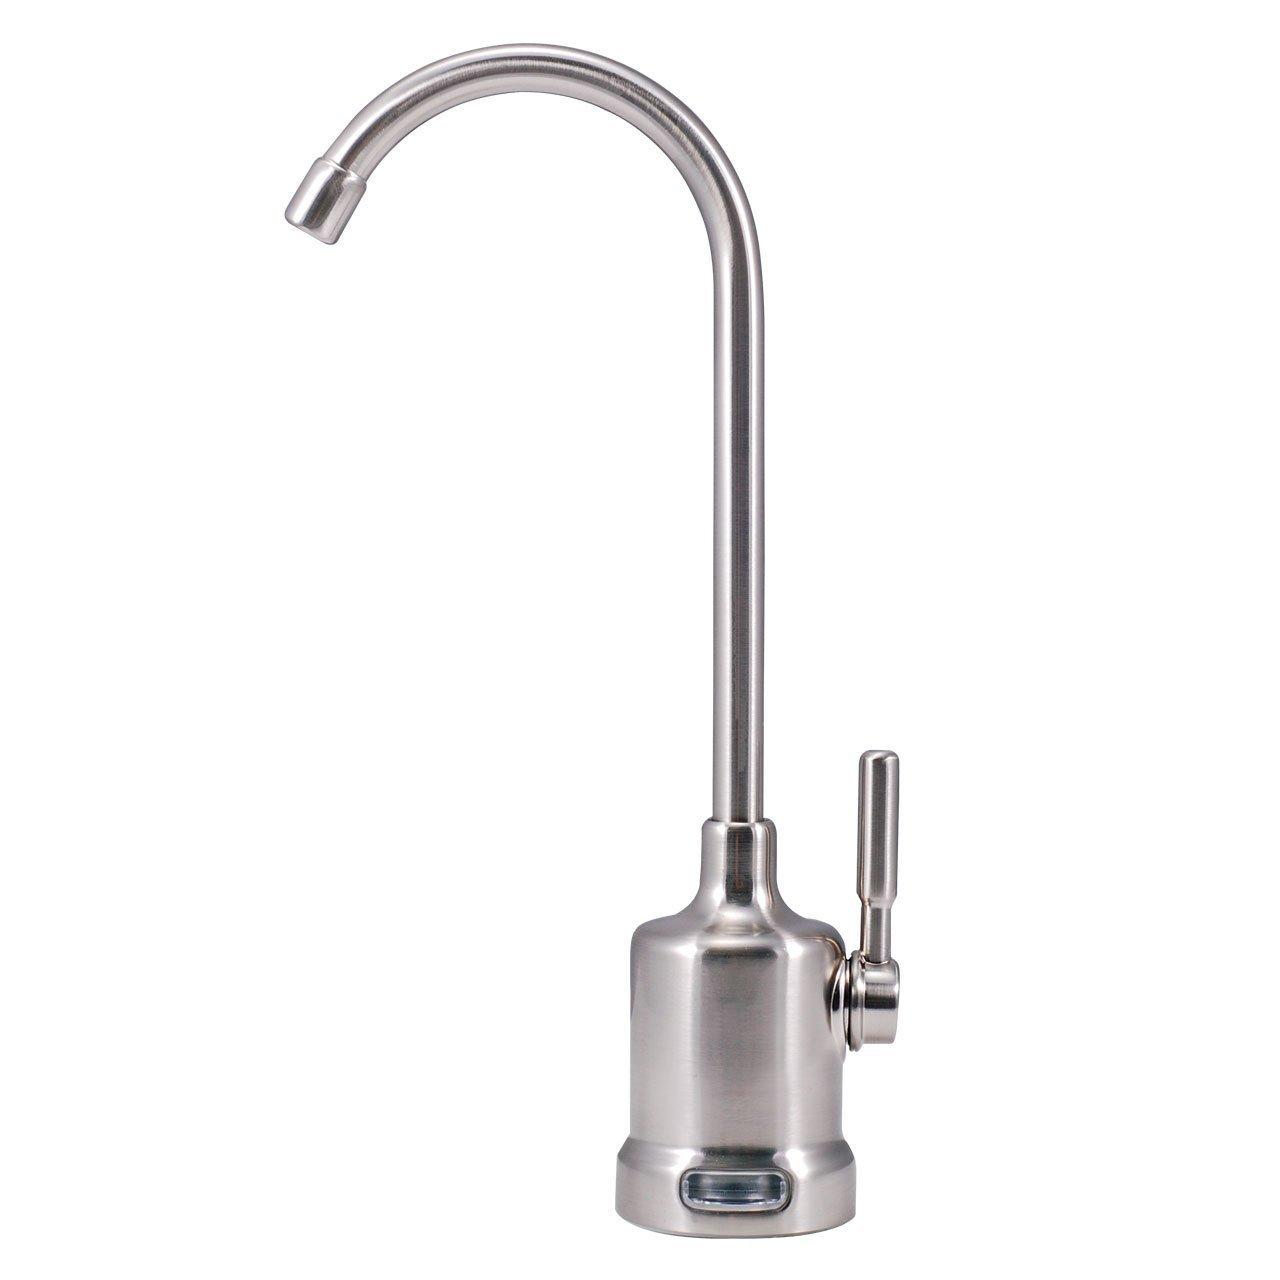 Watts Premier 116093 Air-Gap Top-Mount Monitored Faucet Brushed Nickel